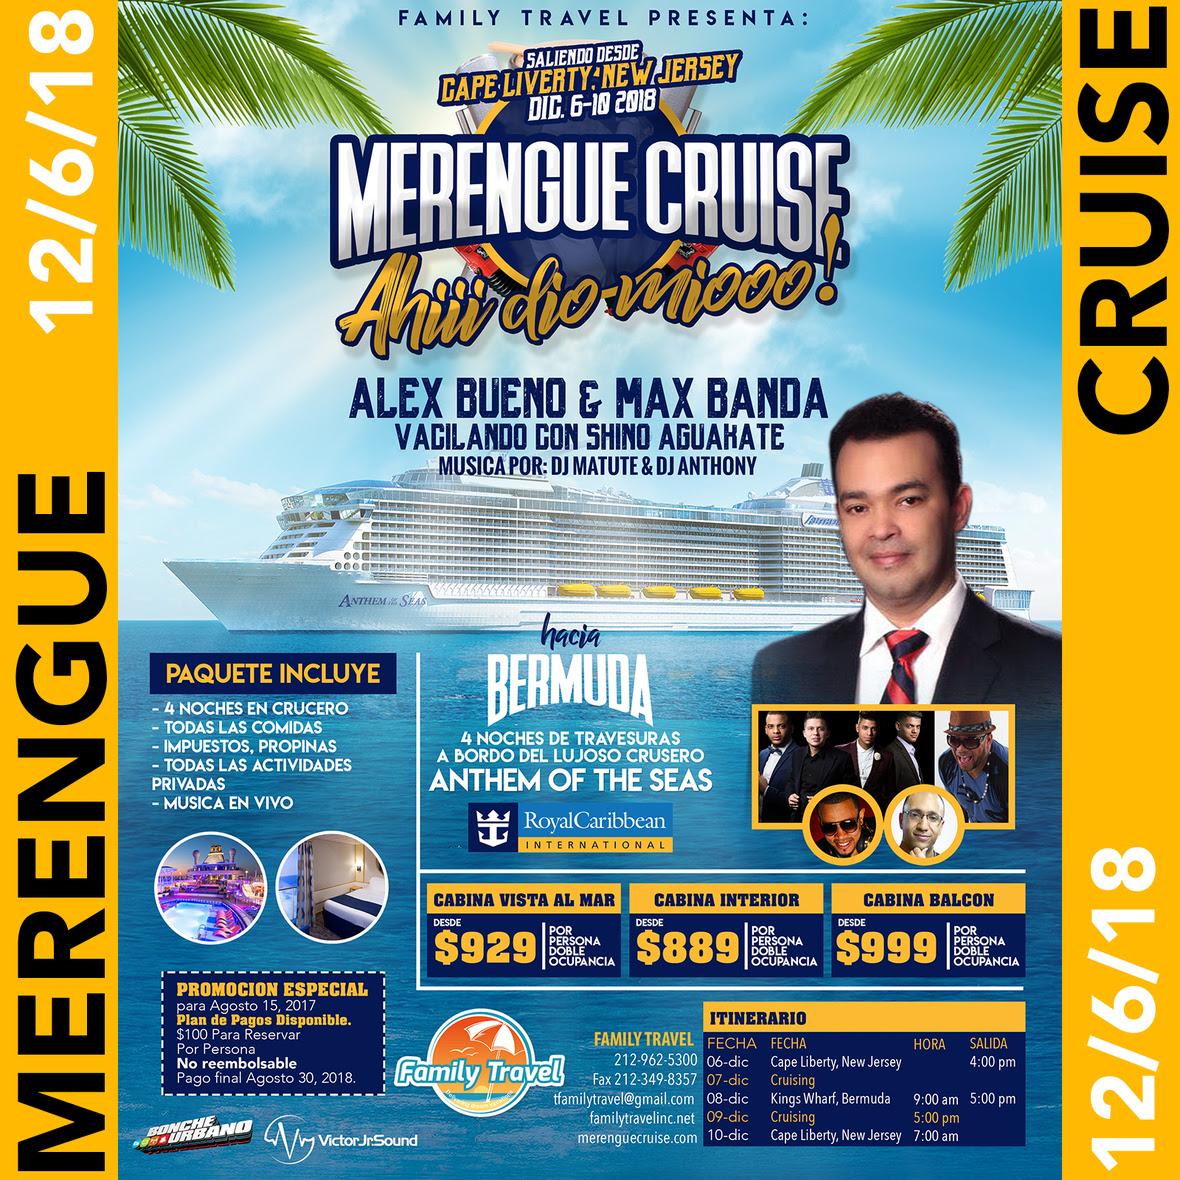 Merenge Cruise Editable-3